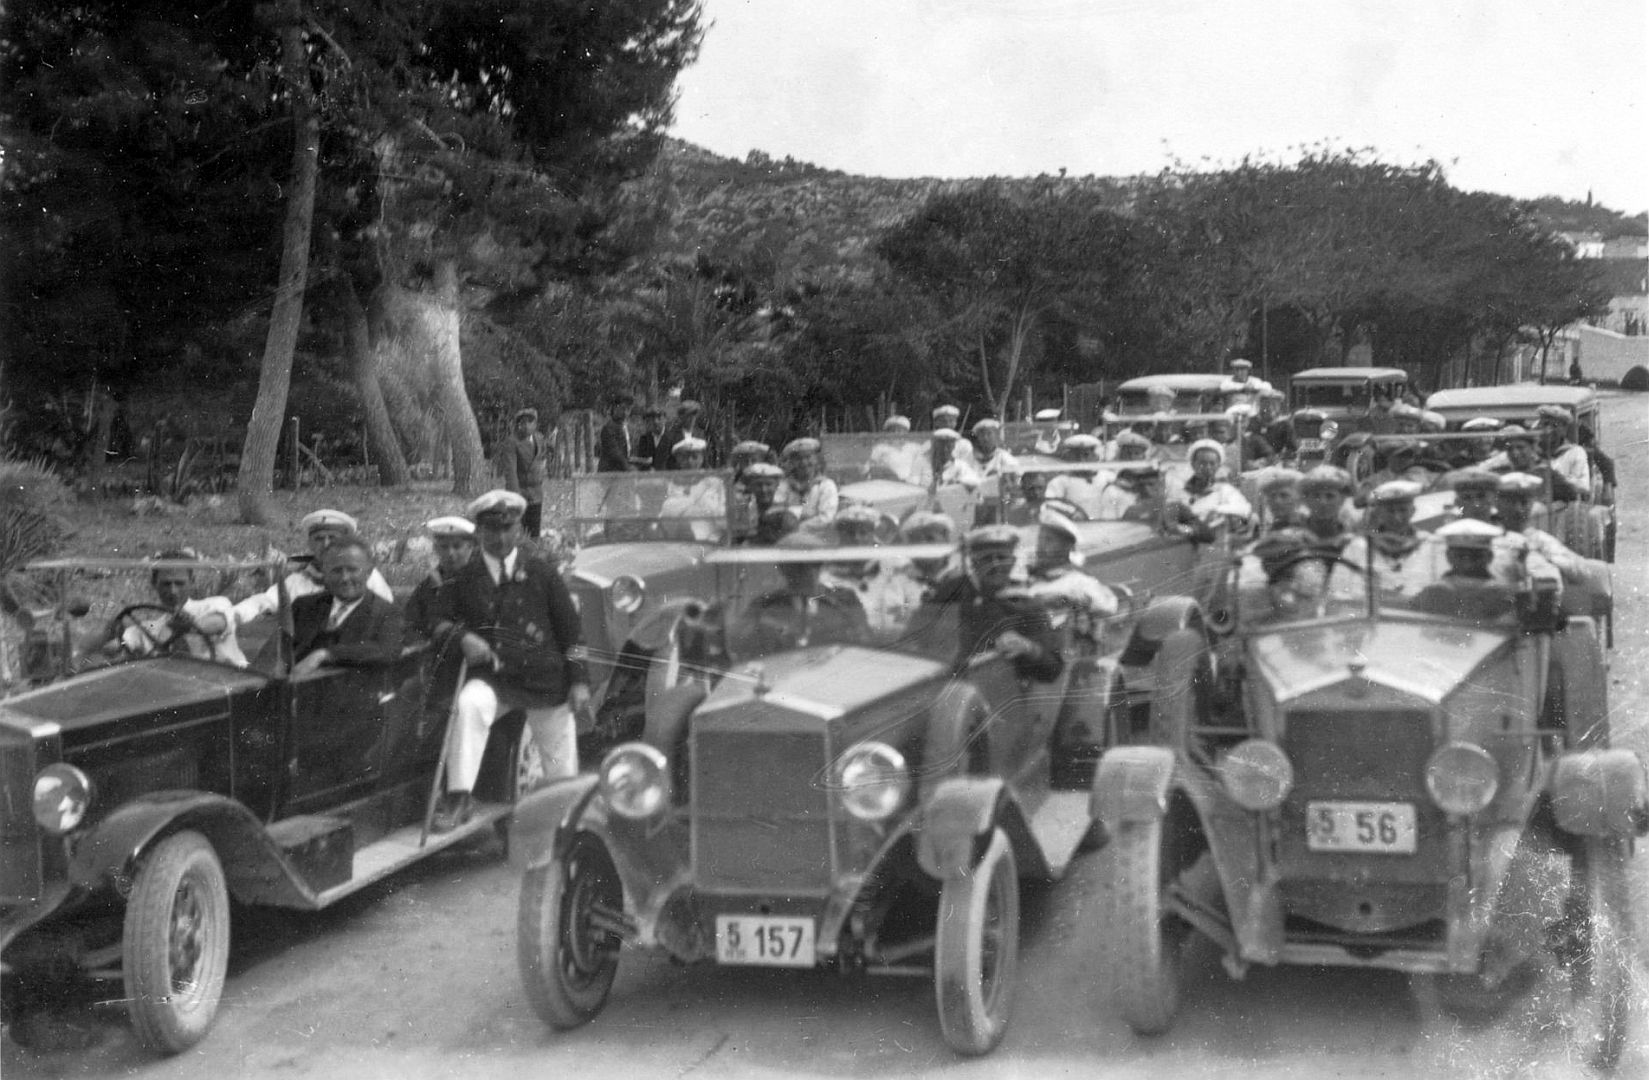 Fiat_taxis_Kreuzer_Königsberg_Catania_1930_Galerie